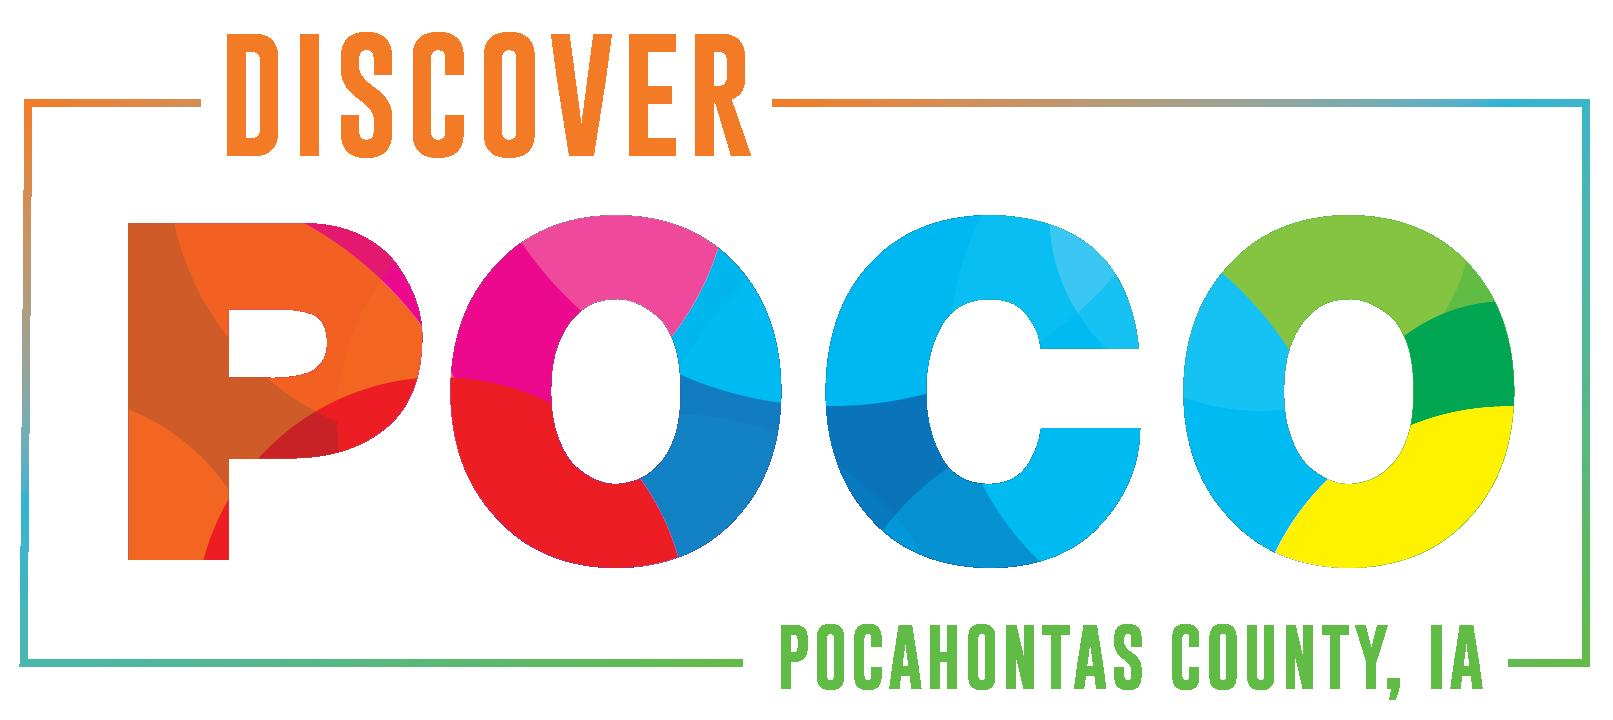 Pocahontas County, IA